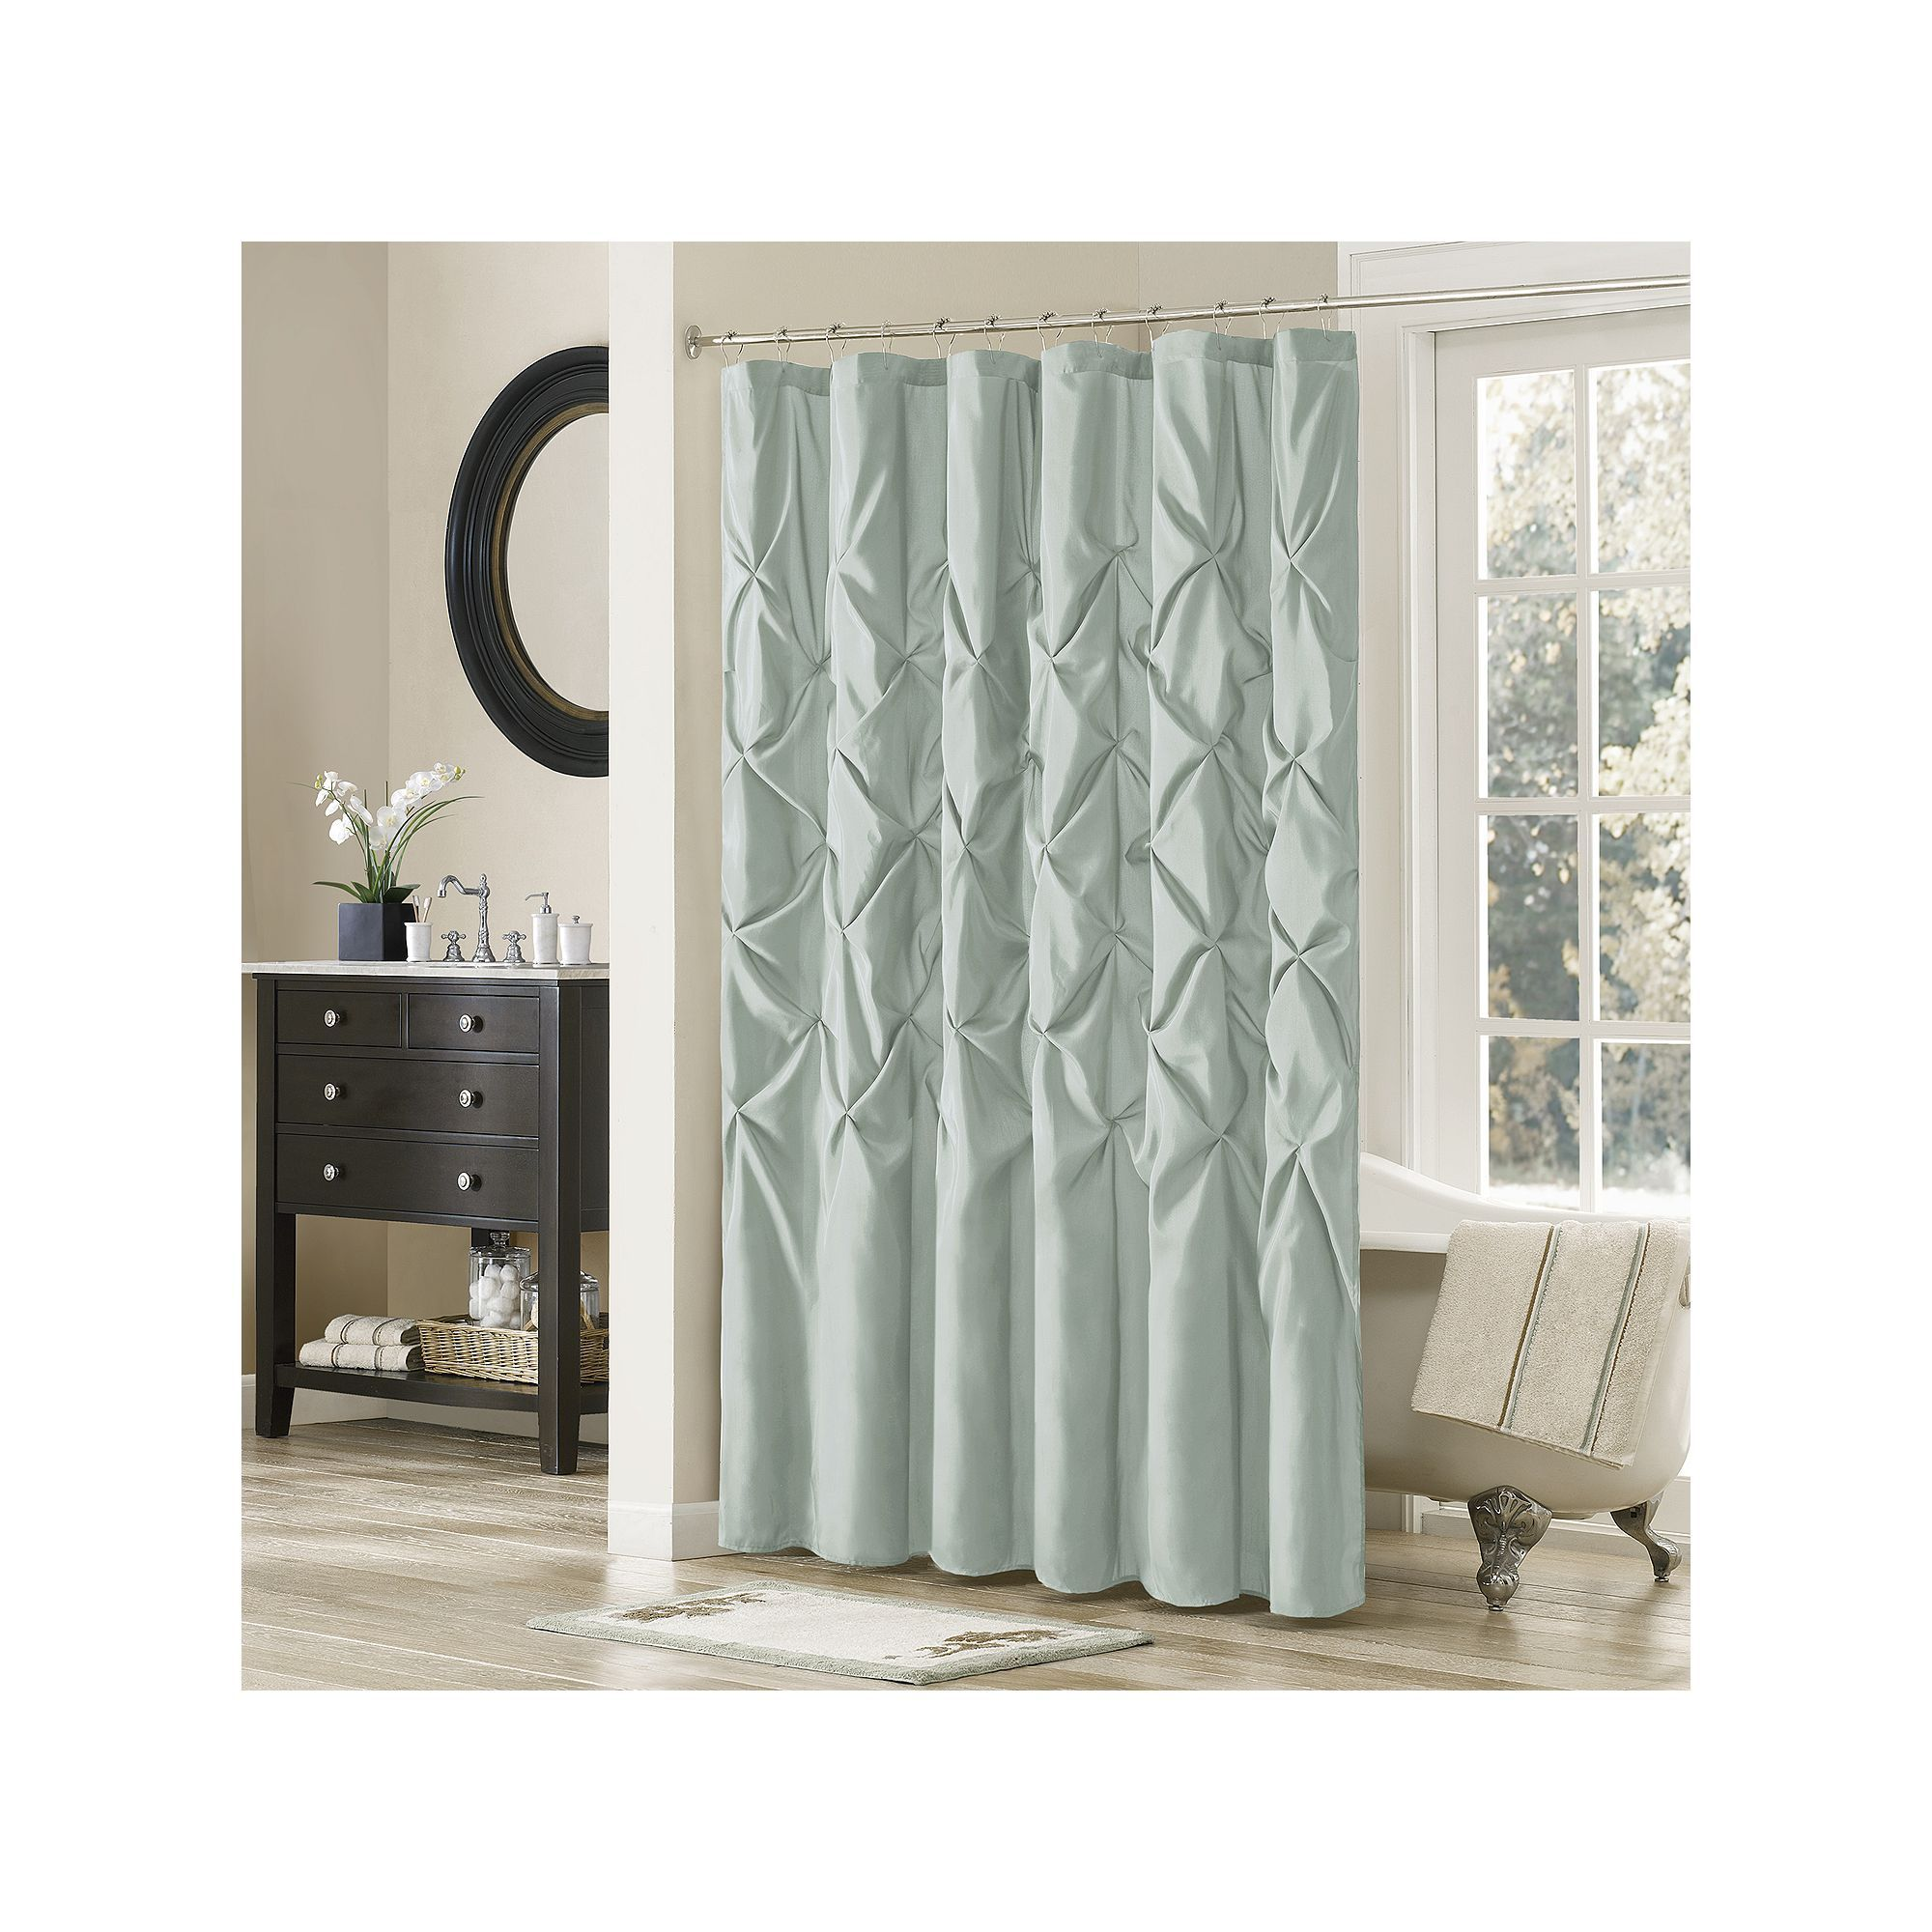 Madison Park Vivian Tufted Shower Curtain Blue 72x72 Curtains